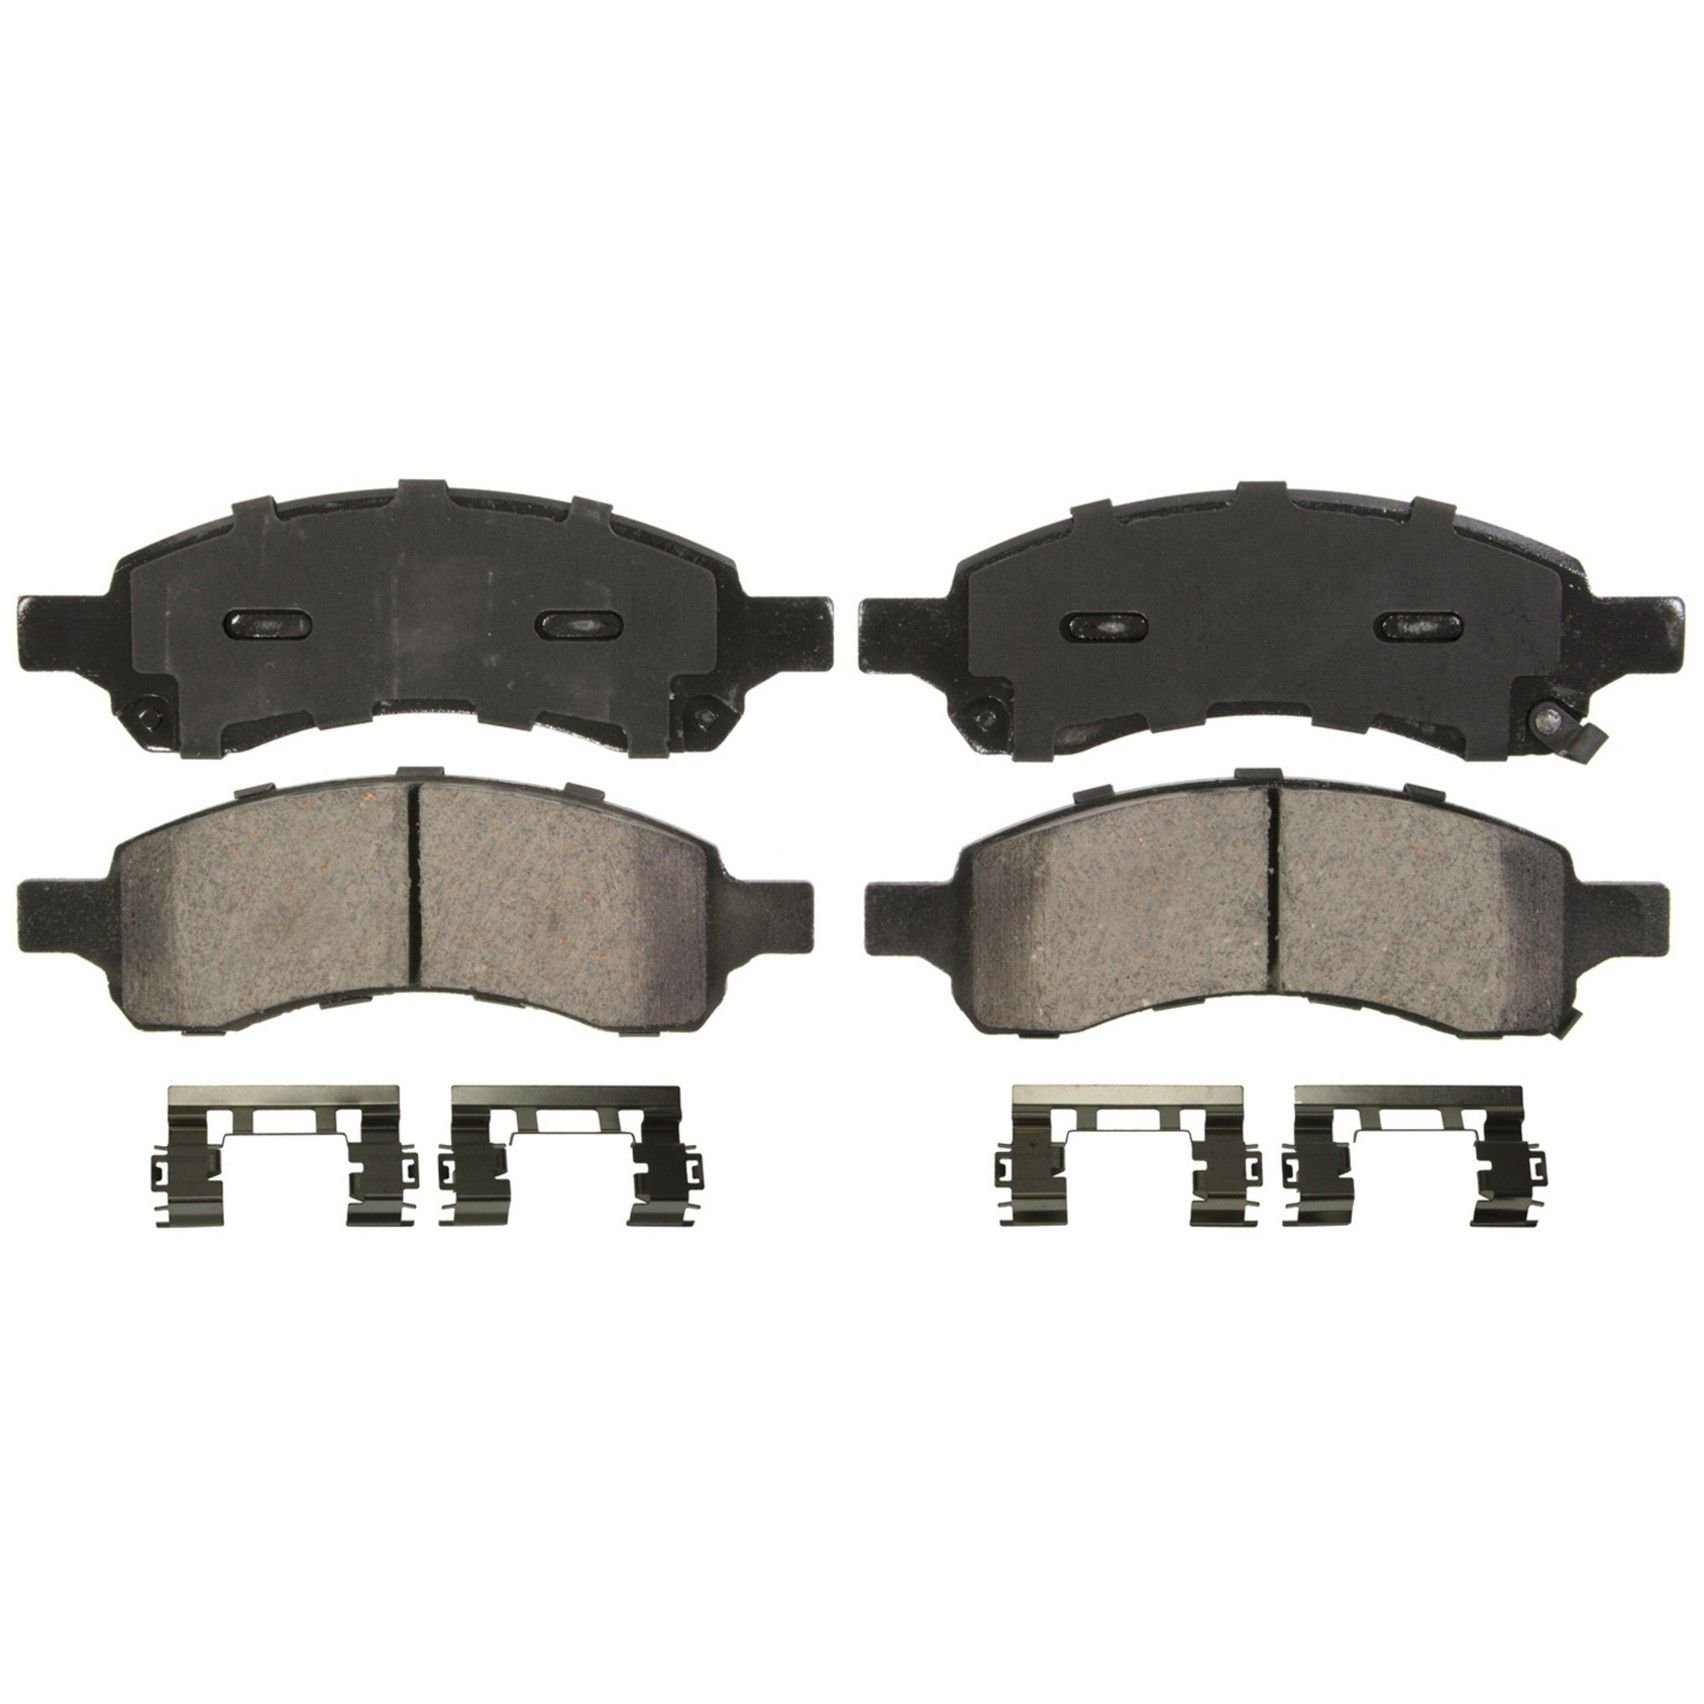 2009 chevrolet colorado disc brake pad front wagner brakes zd1169 oe ceramic includes installation hardware kit quickstop